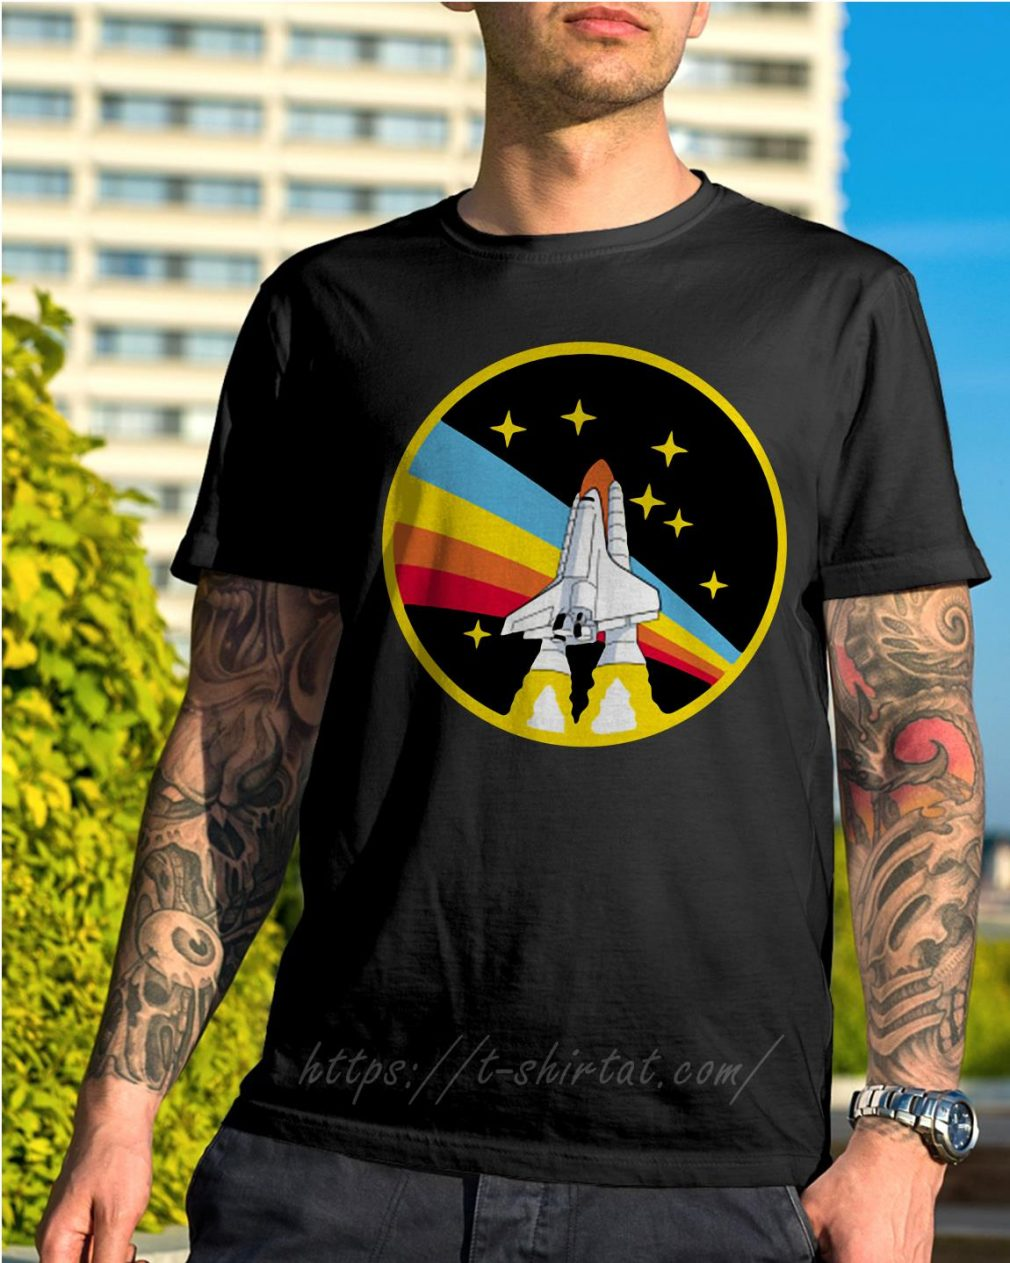 Rainbow rocket spaceship shirt